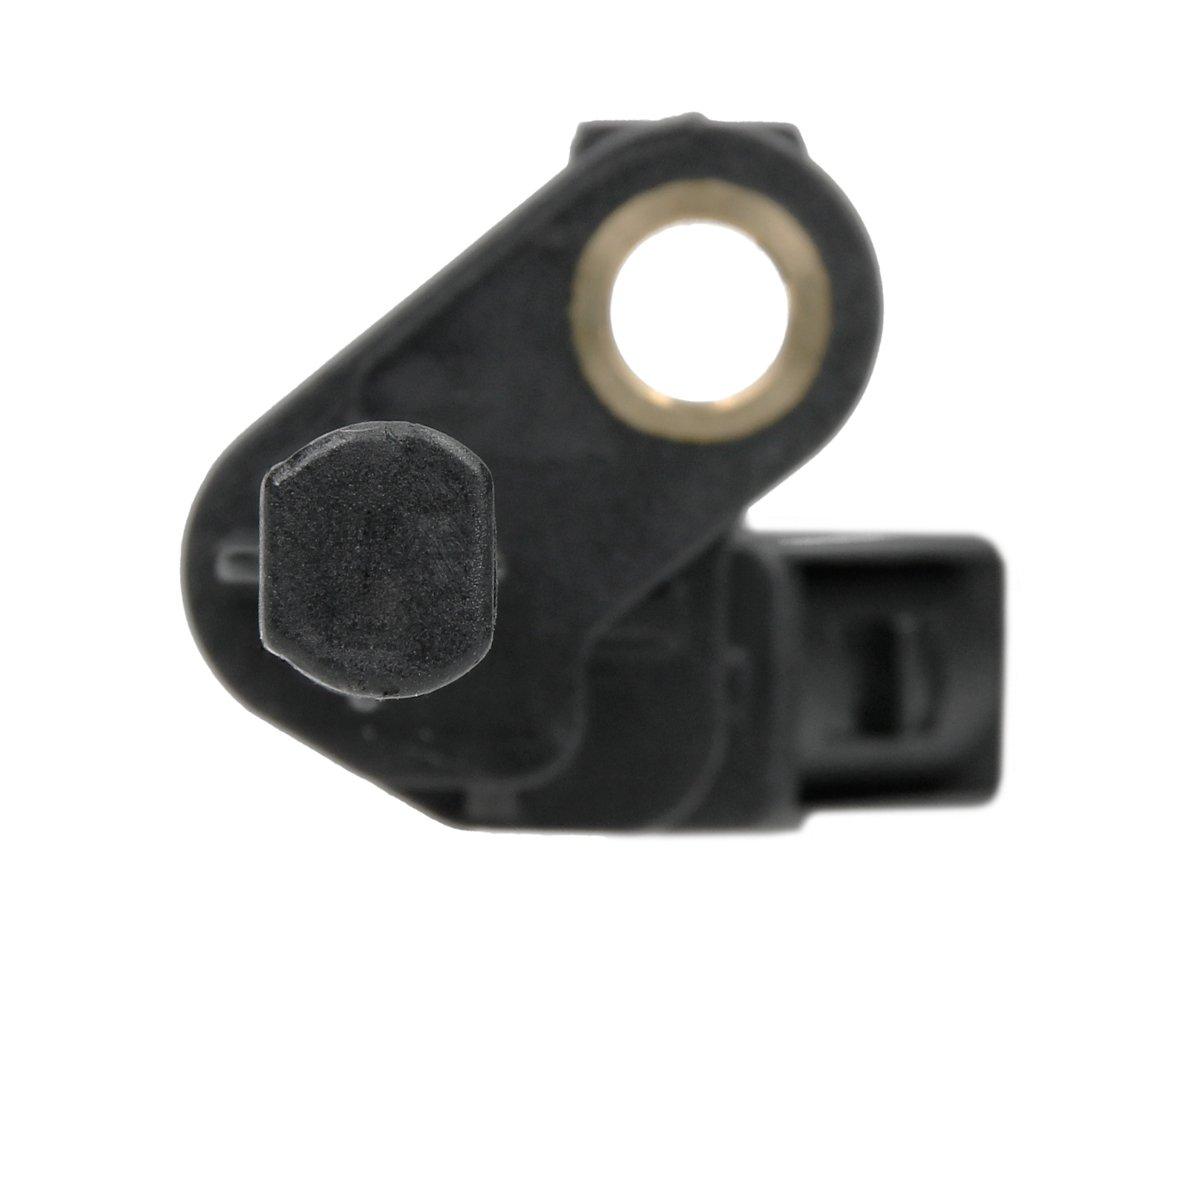 ECD Germany RS23810 RS23808 Raddrehzahlsensor Raddrehzahl ABS Sensor hinten links rechts